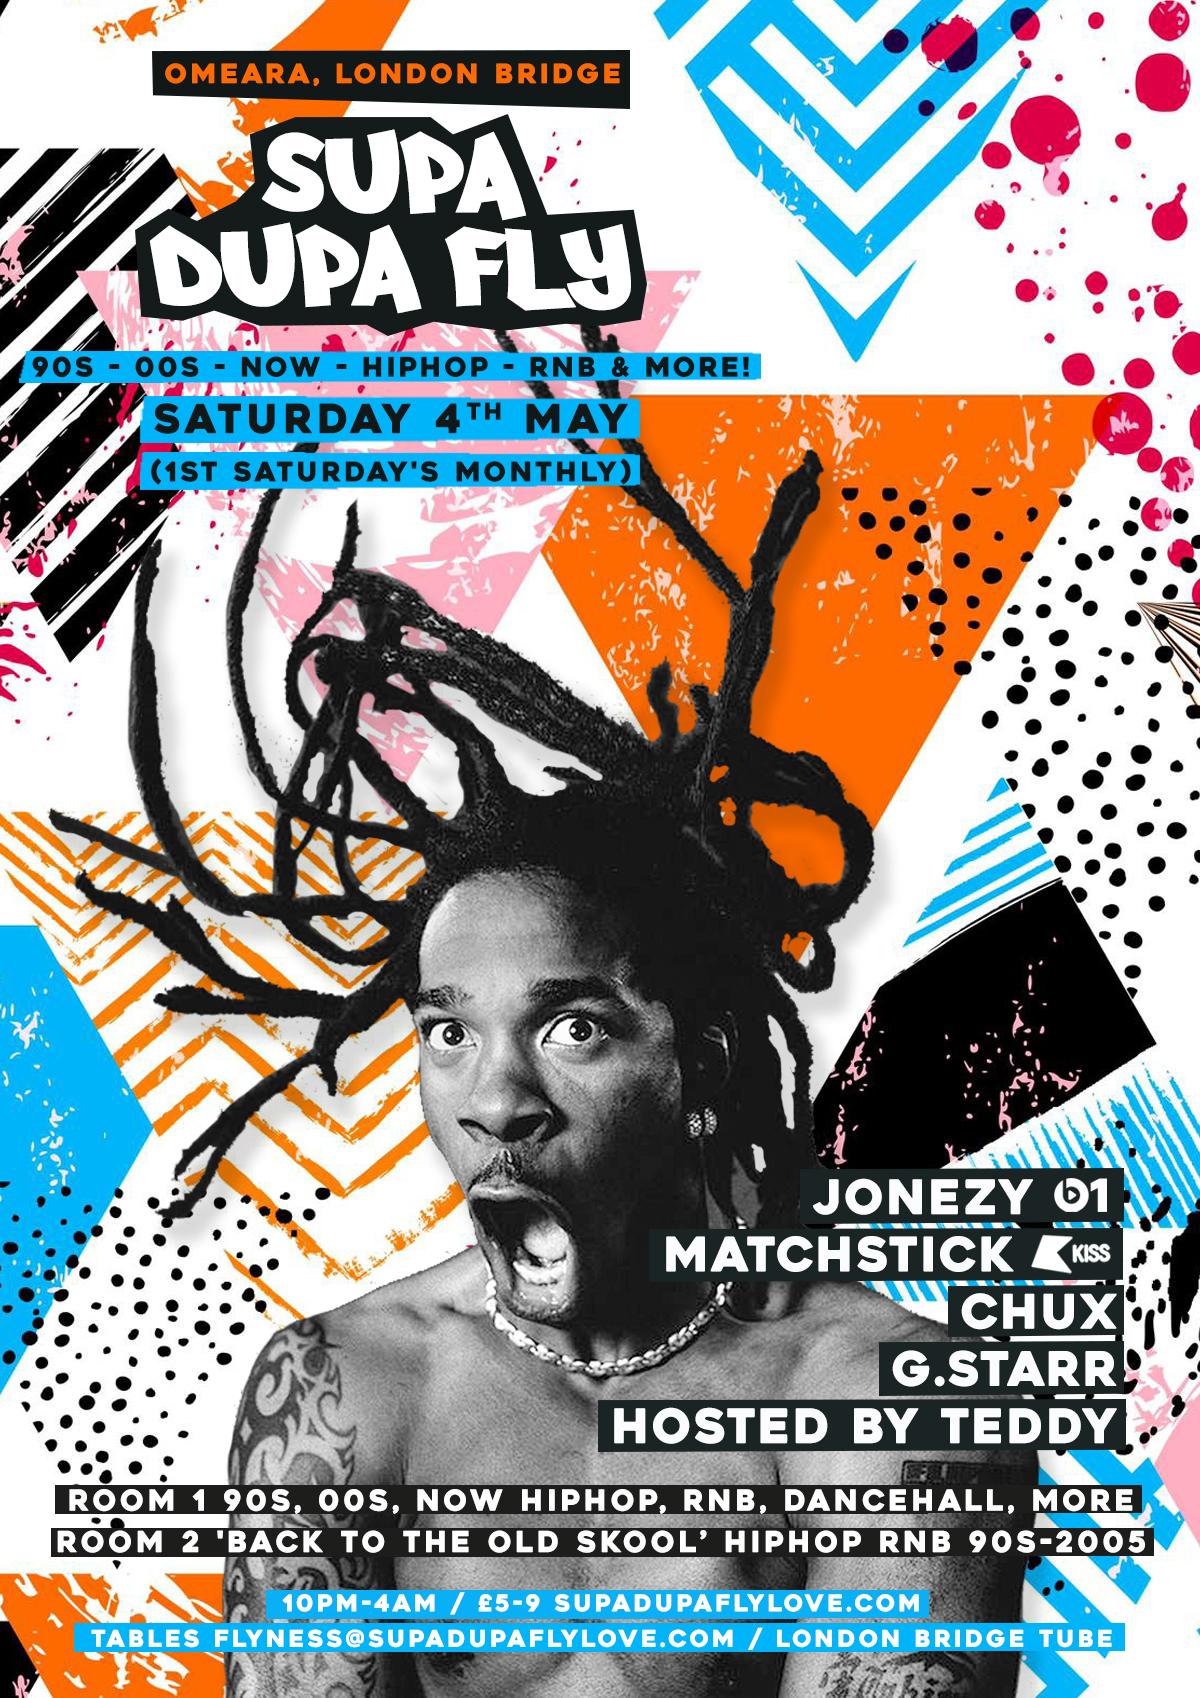 dd6626921cf Supa Dupa Fly x Omeara x 1st Sats